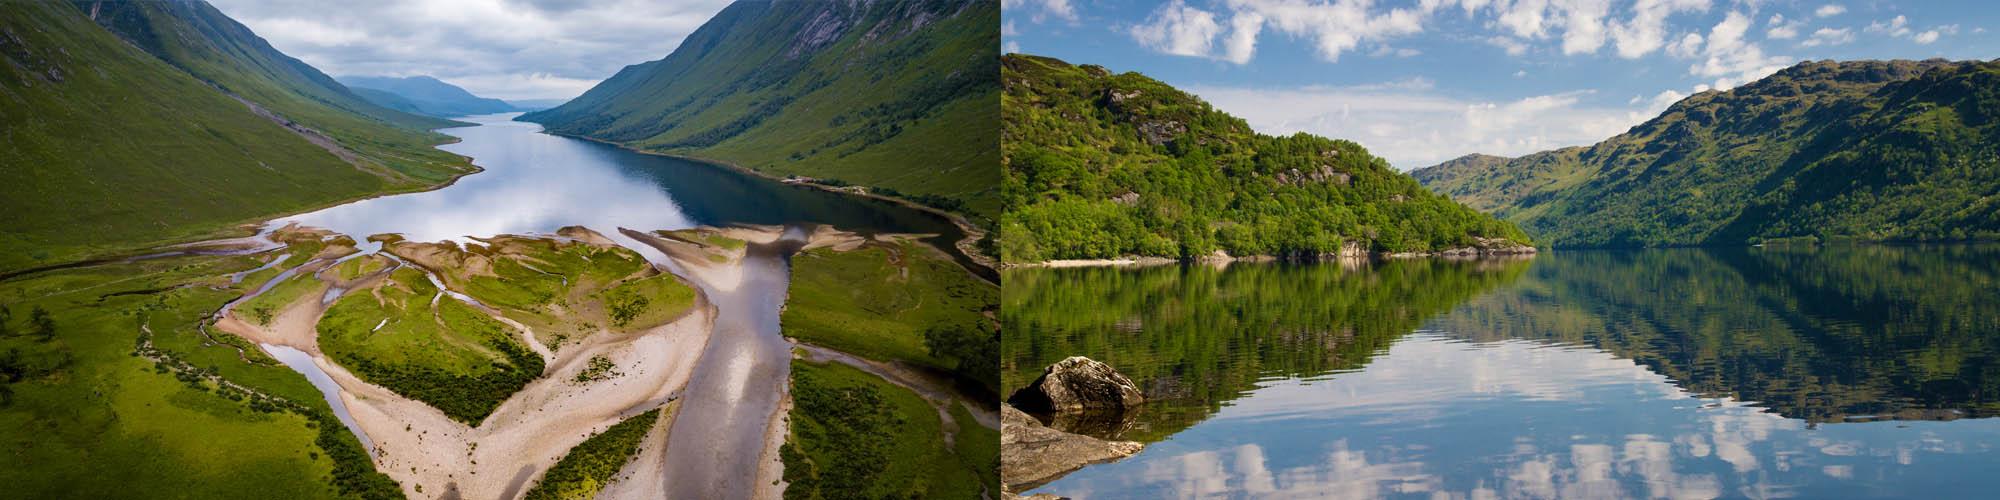 6 Day West Highland Way Walk Scotland